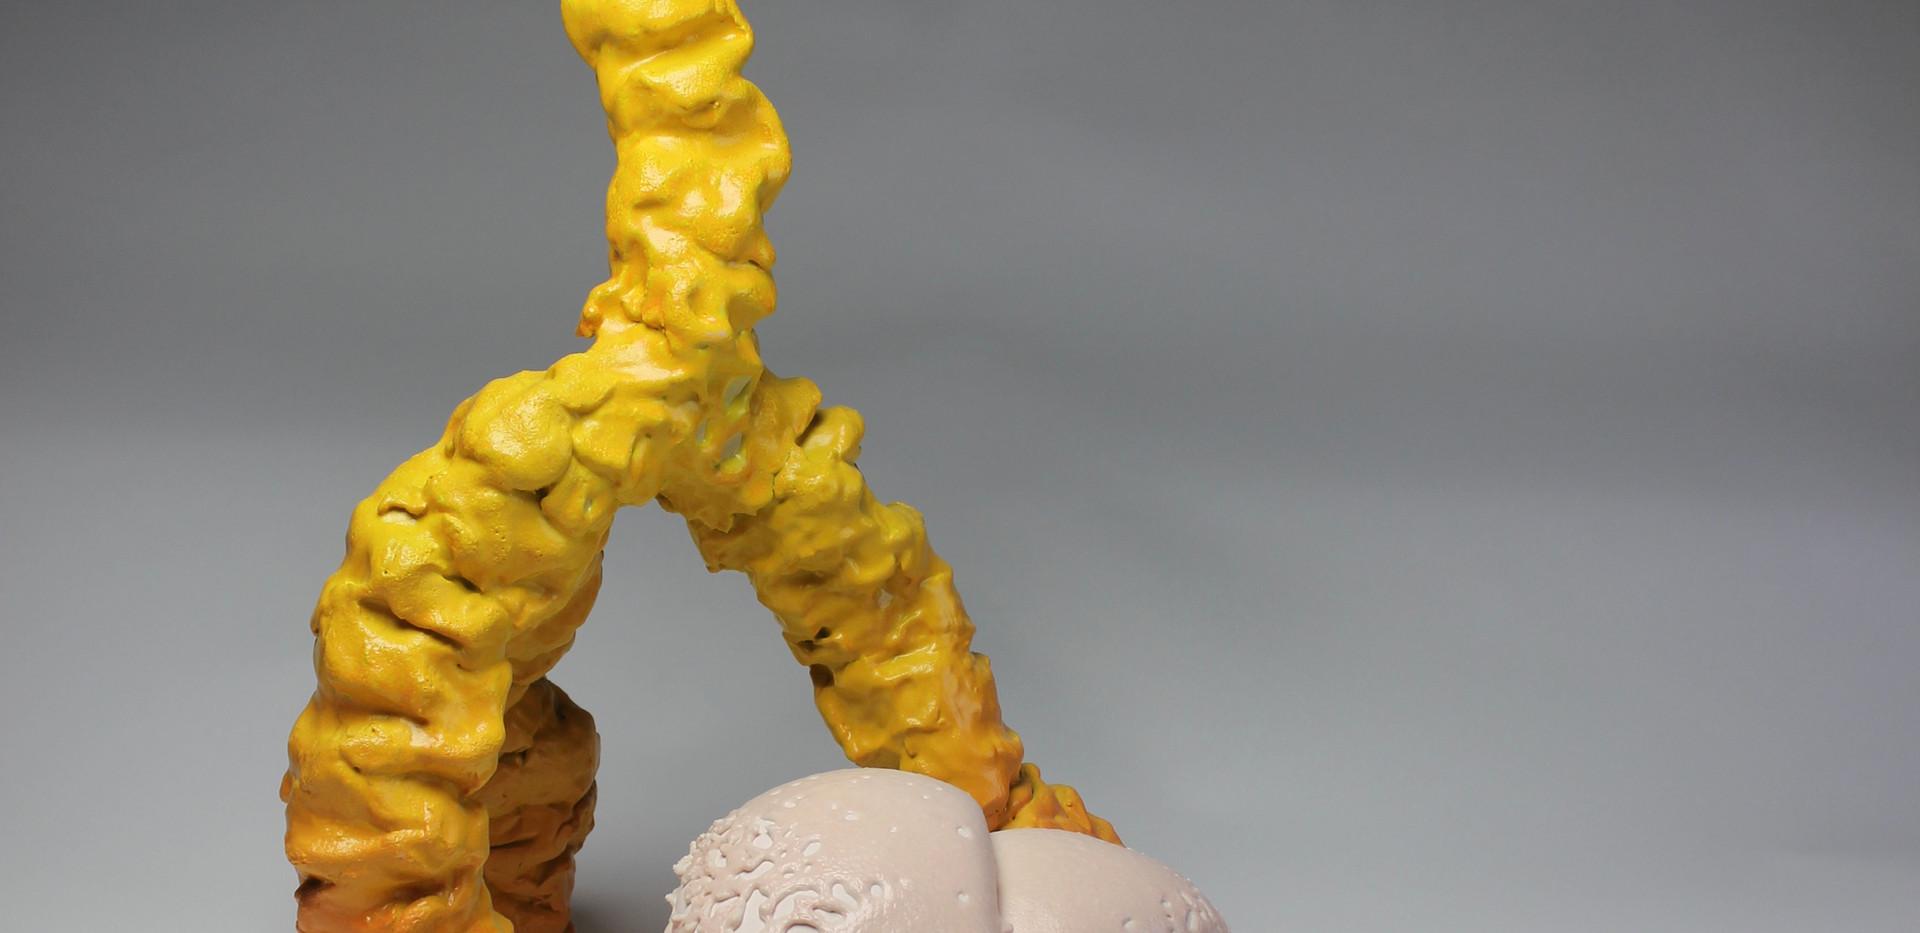 Big yellow and chicken skin